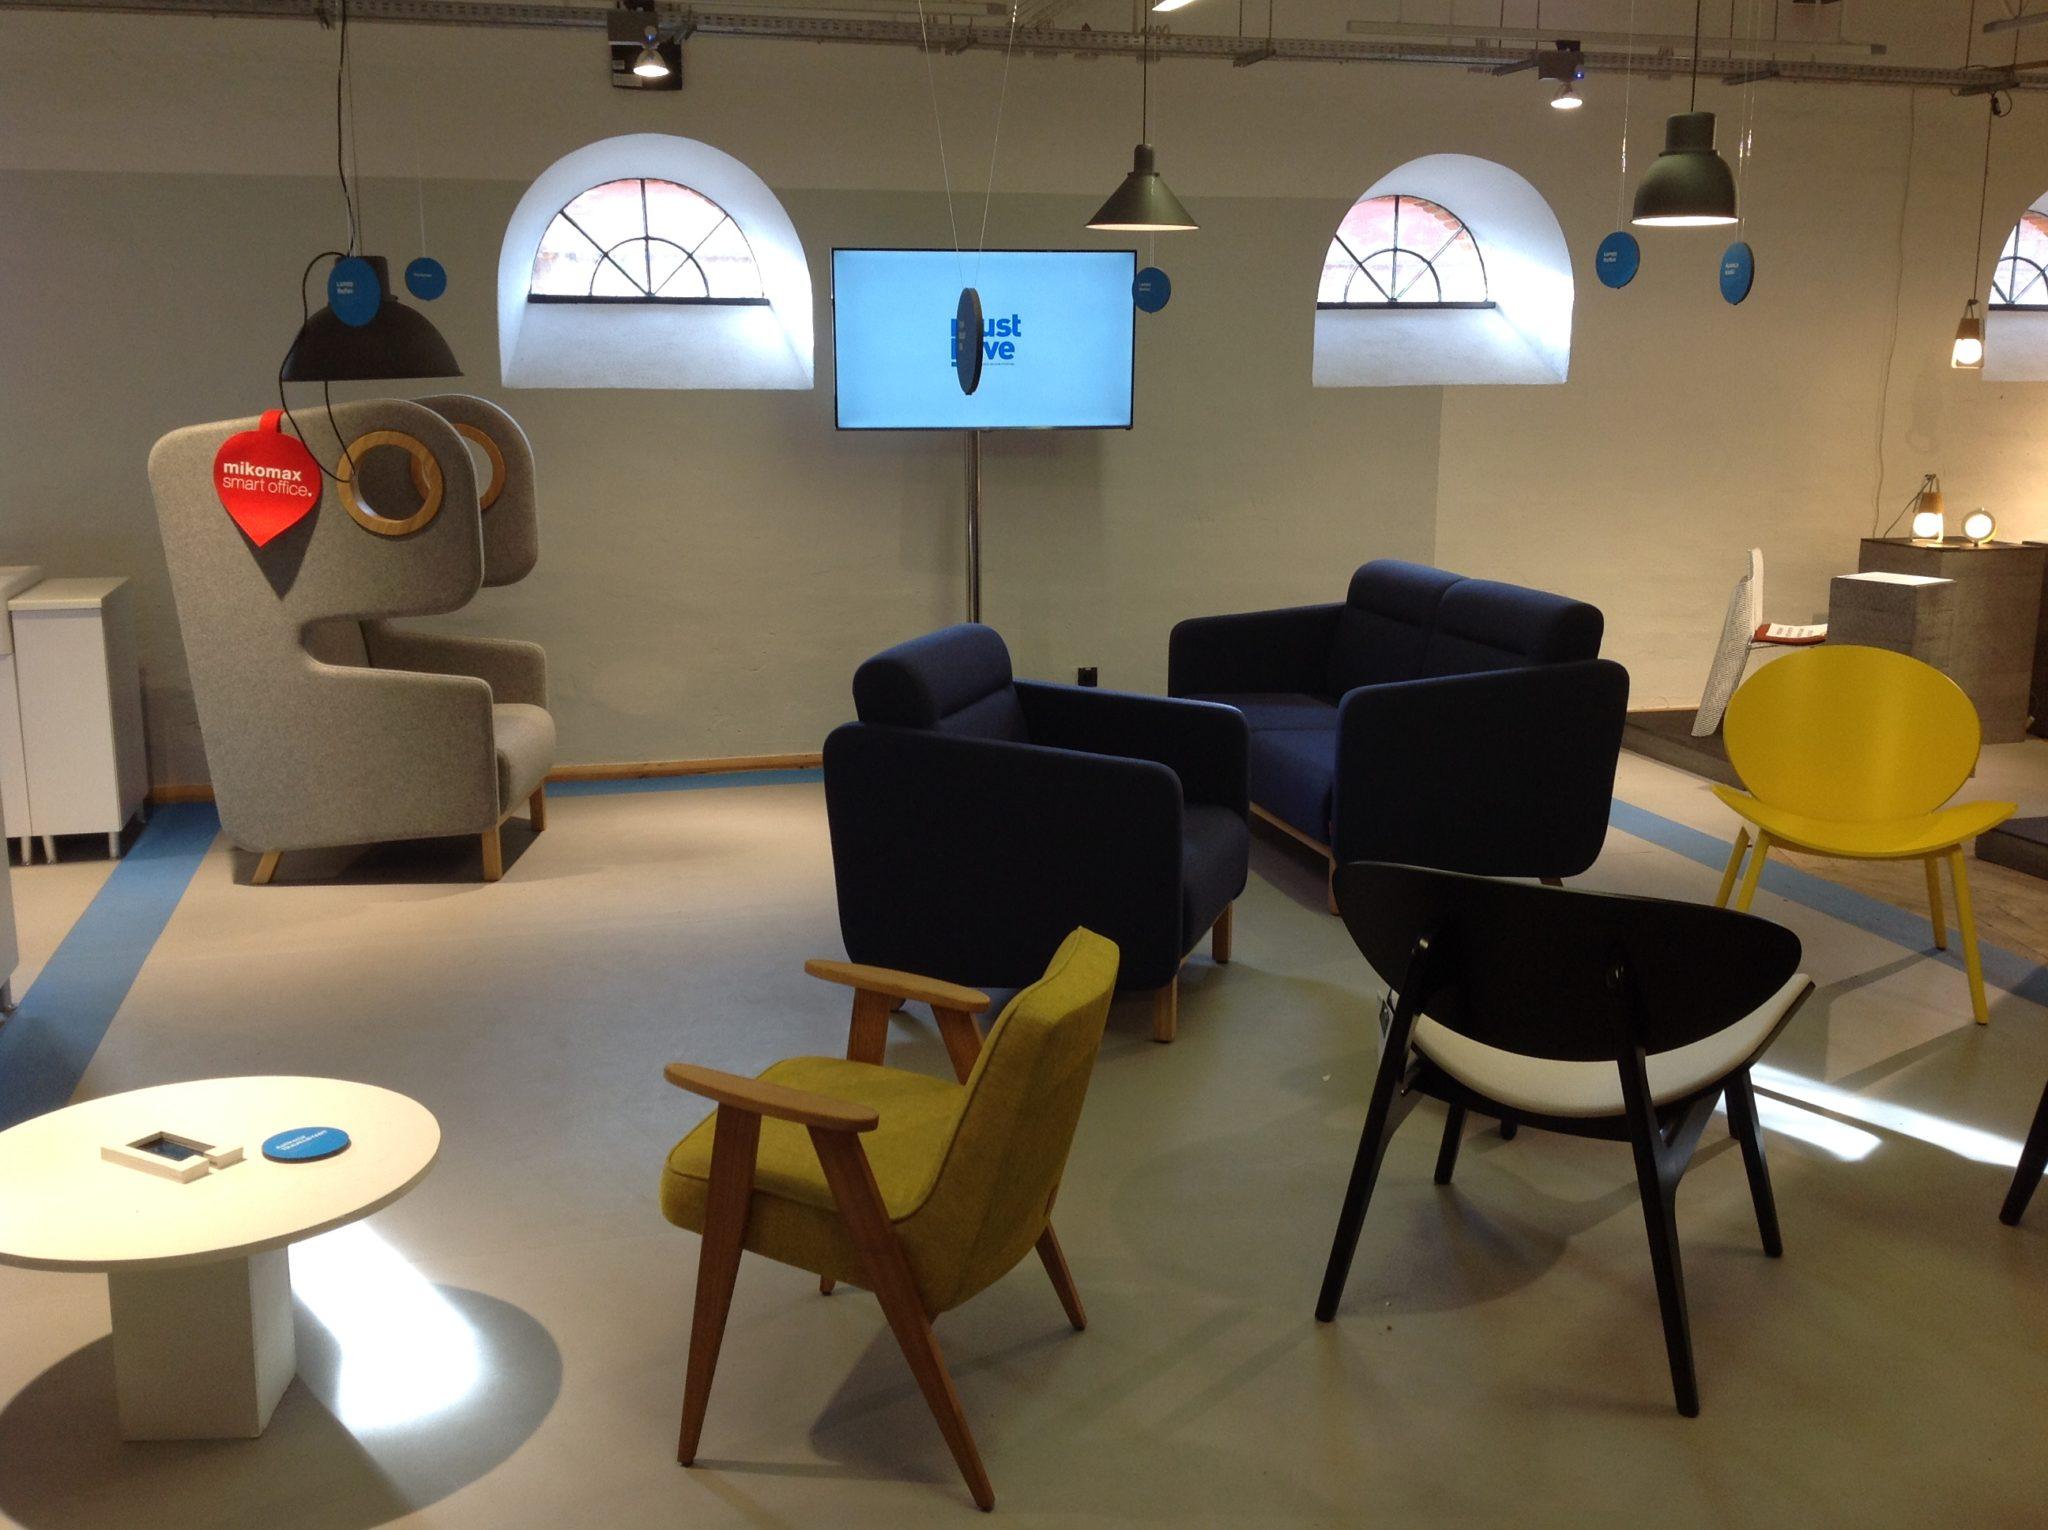 6 lodz-design-festival-festiwal-designu-must-have-oskar-zieta-projektowanie-polscy-projektanci-interior-design-home-ideas-forelements-blog